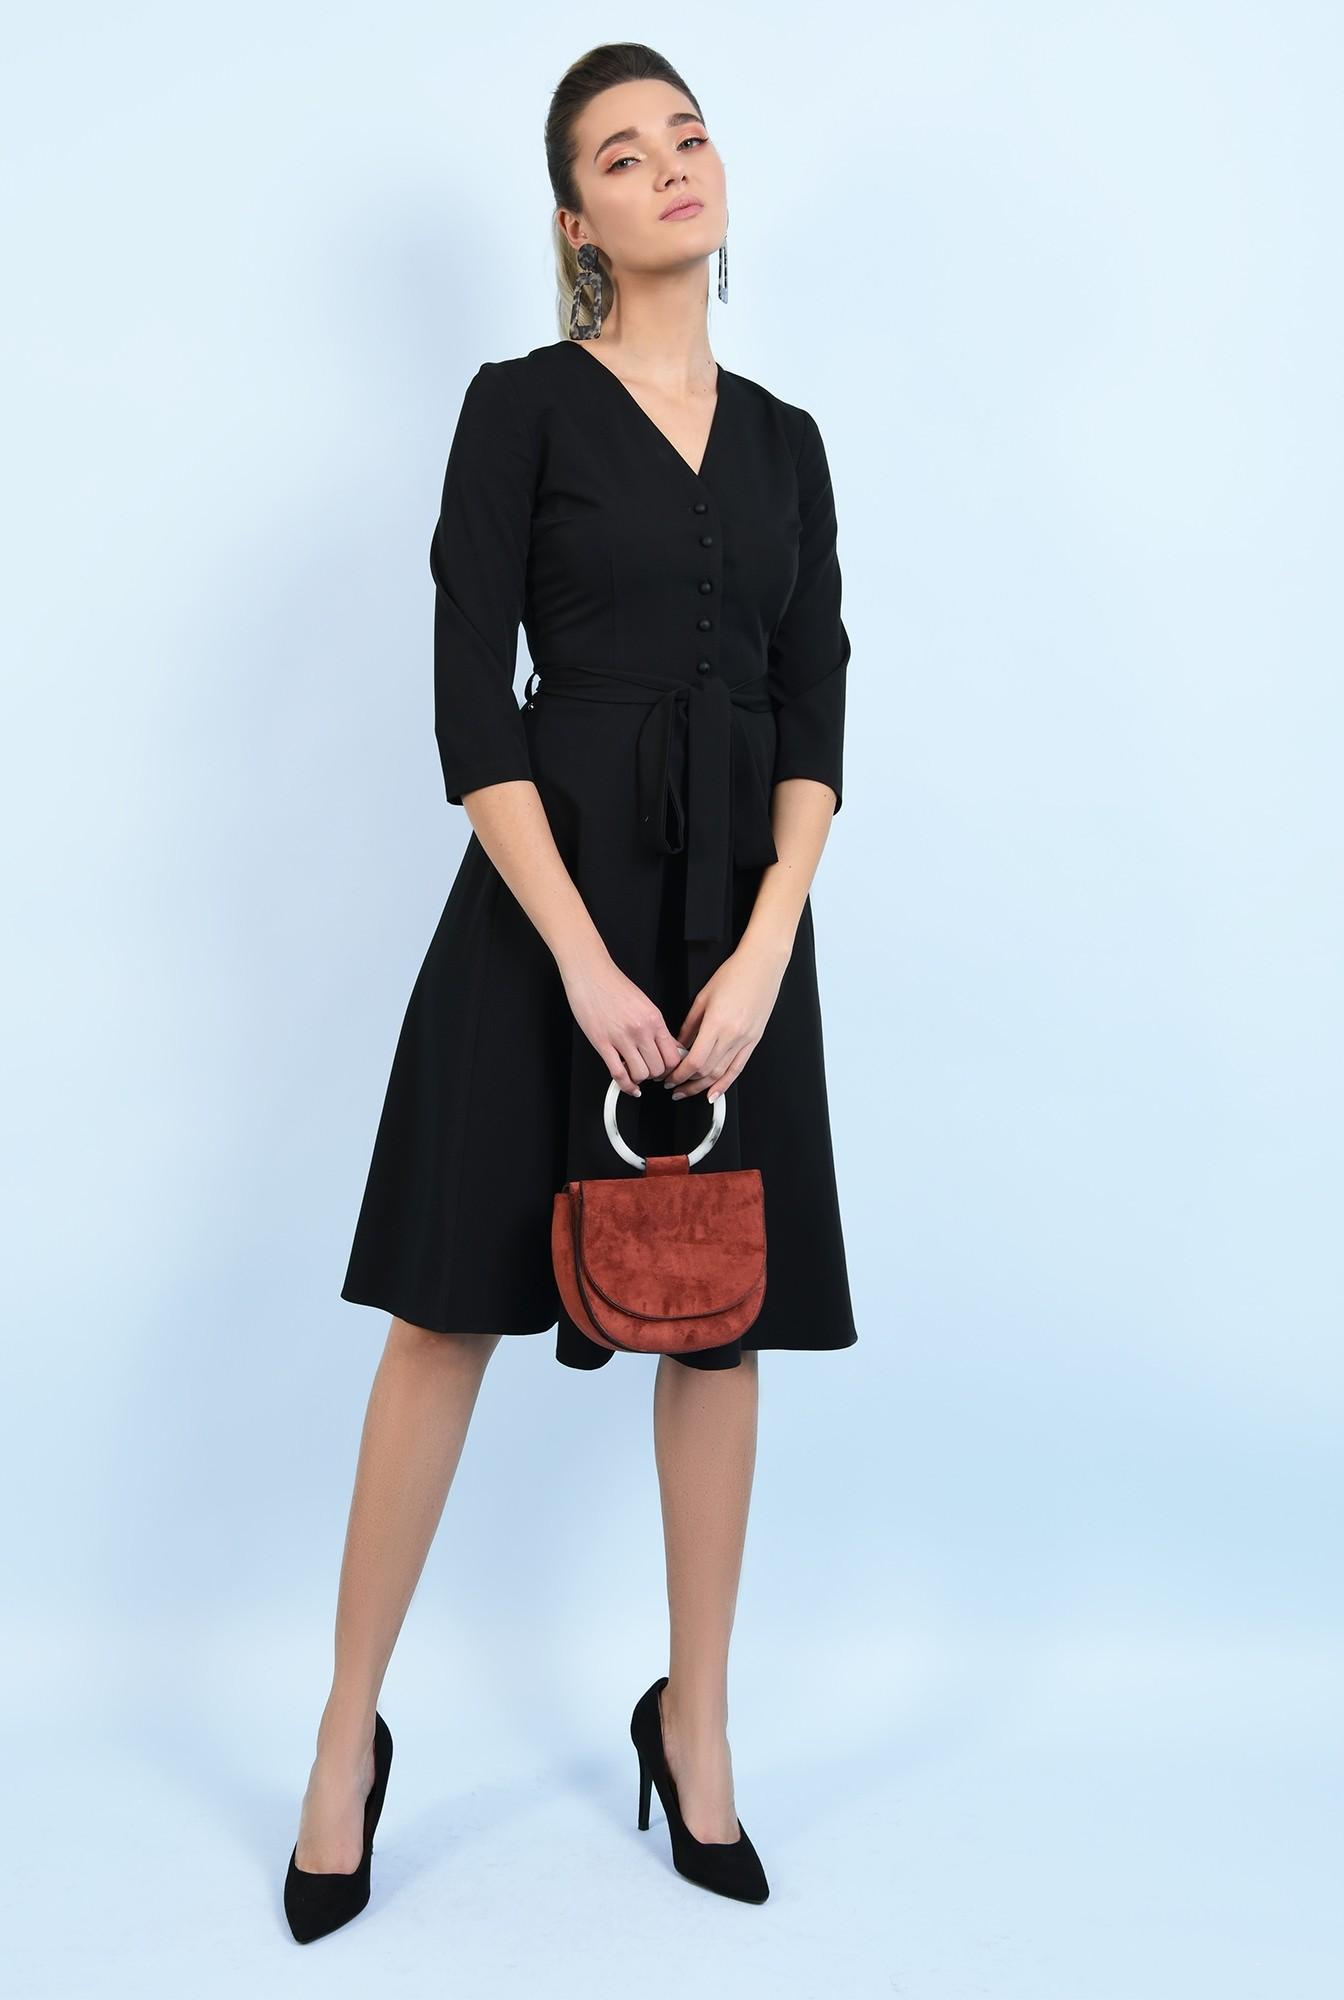 360 - rochie office, neagra, midi, cu nasturi, cu cordon